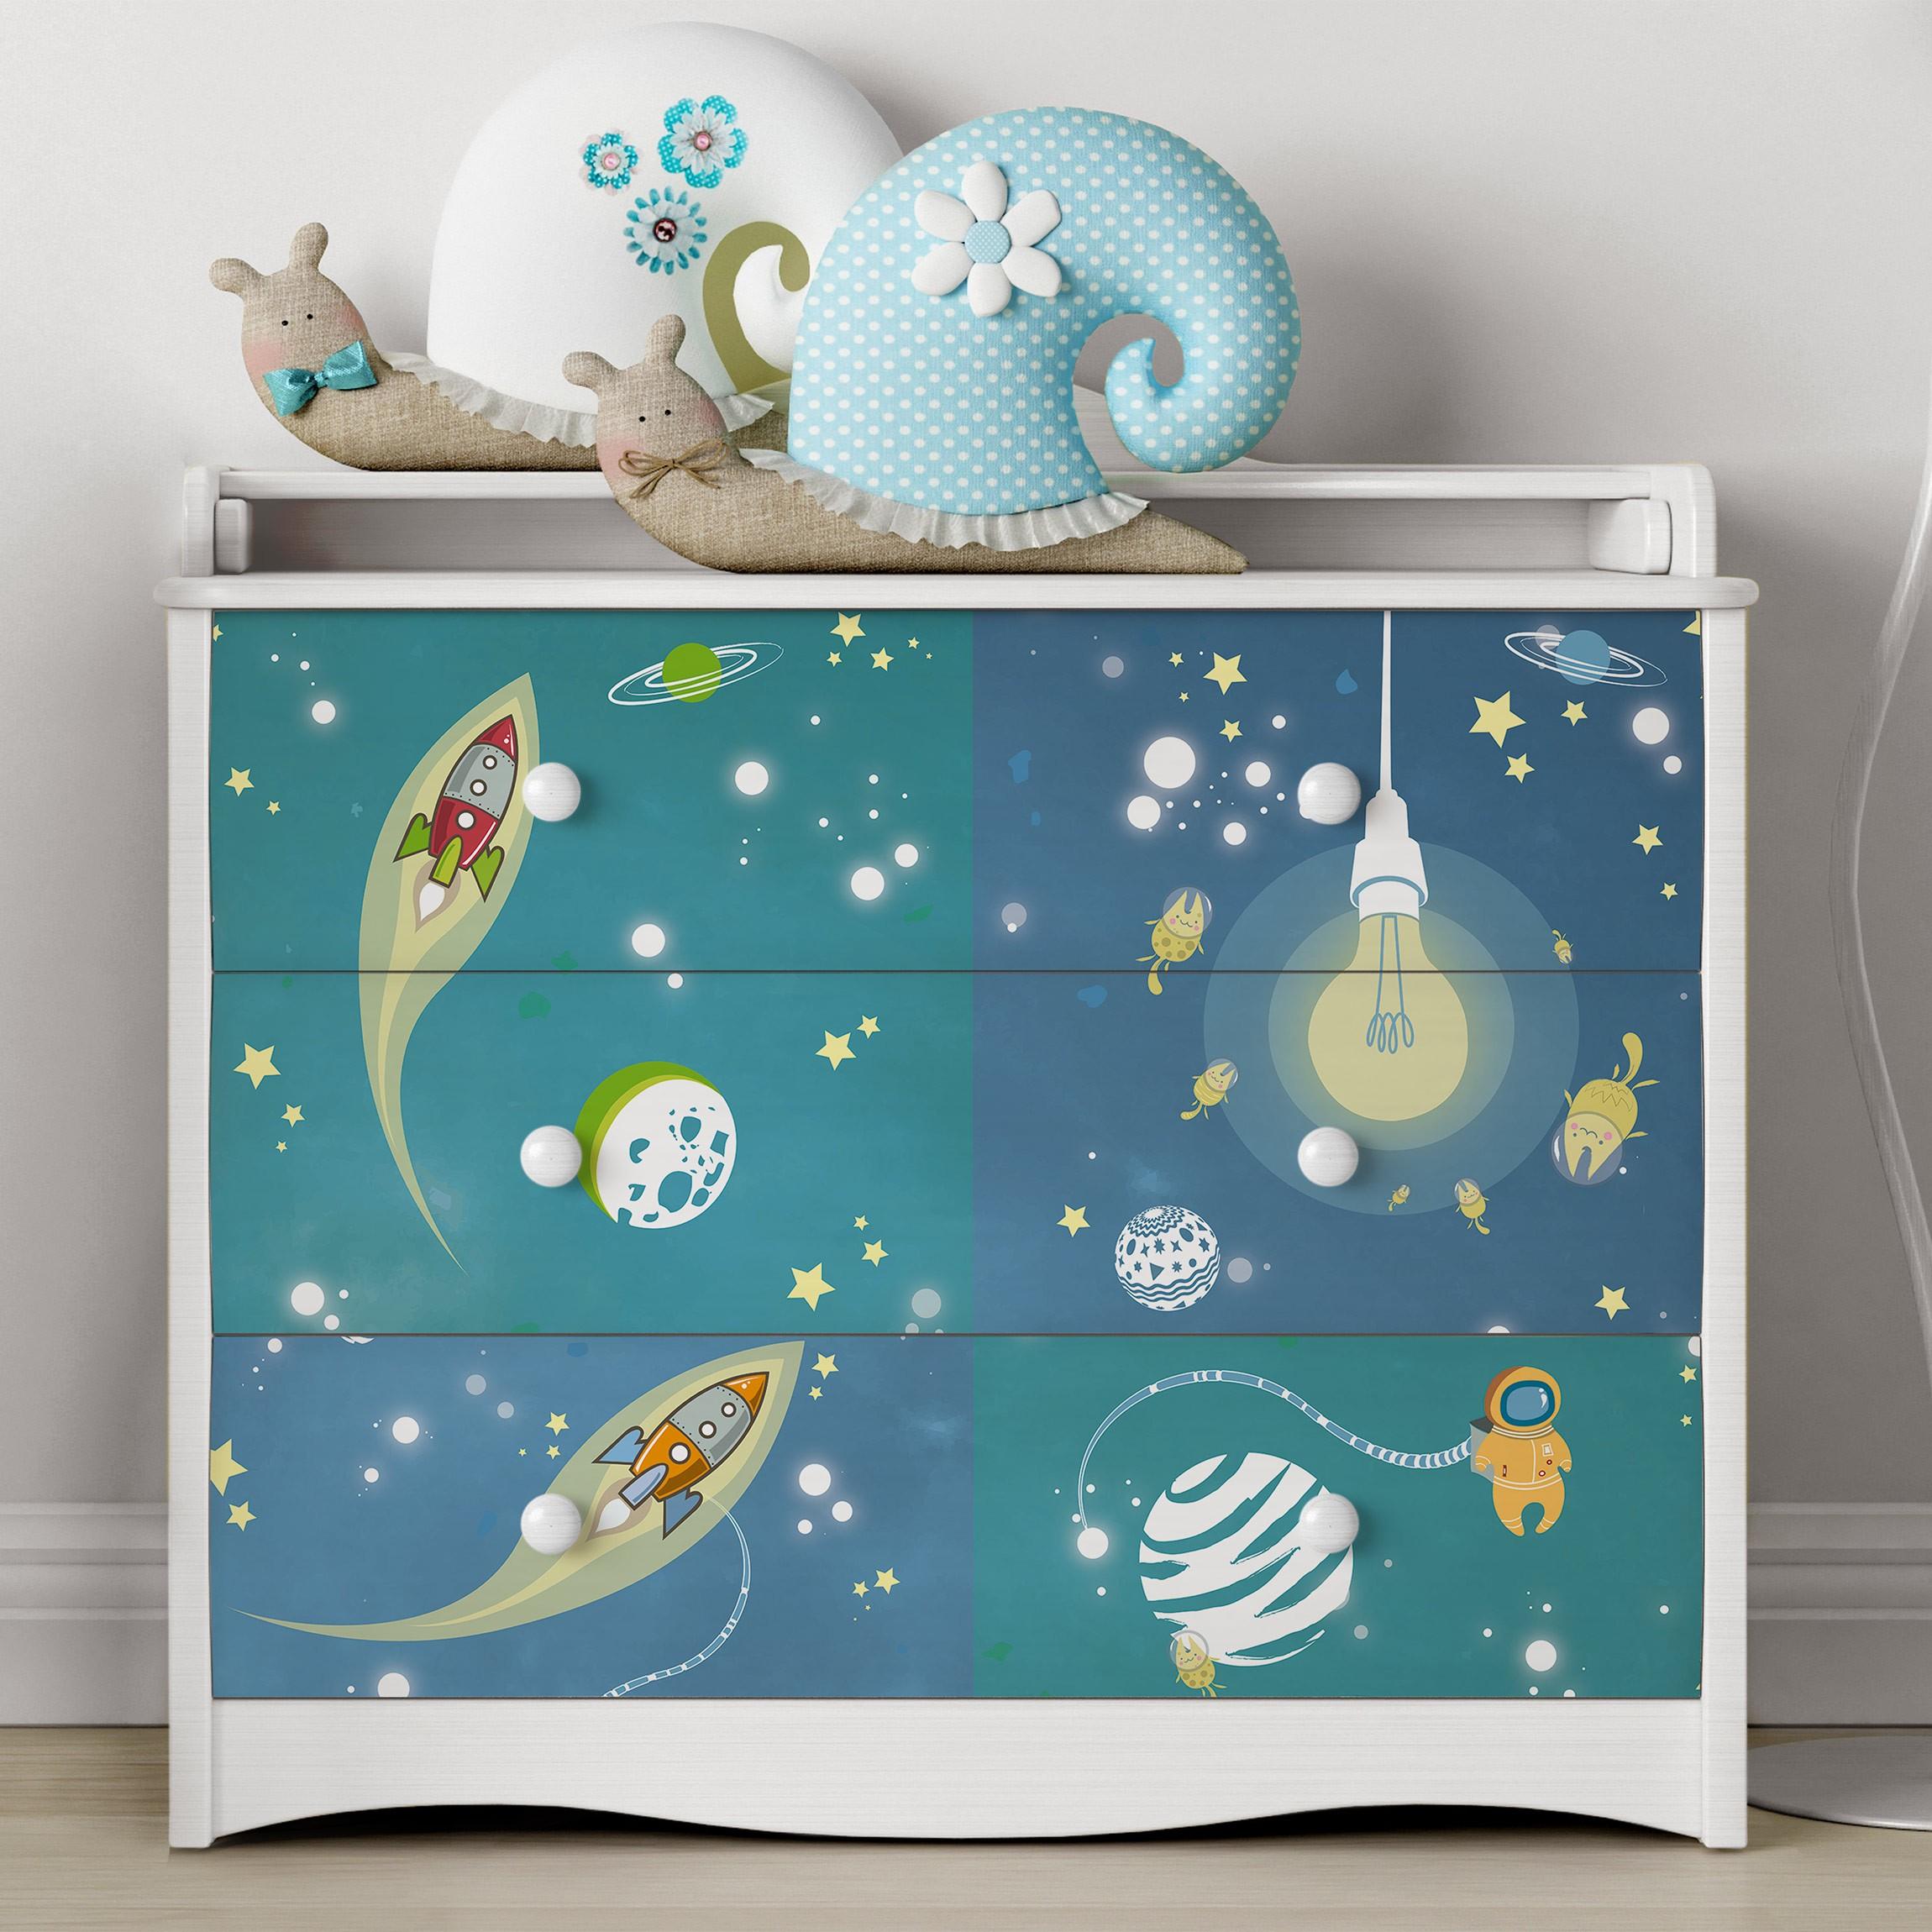 carta adesiva per mobili universe and astronauts set